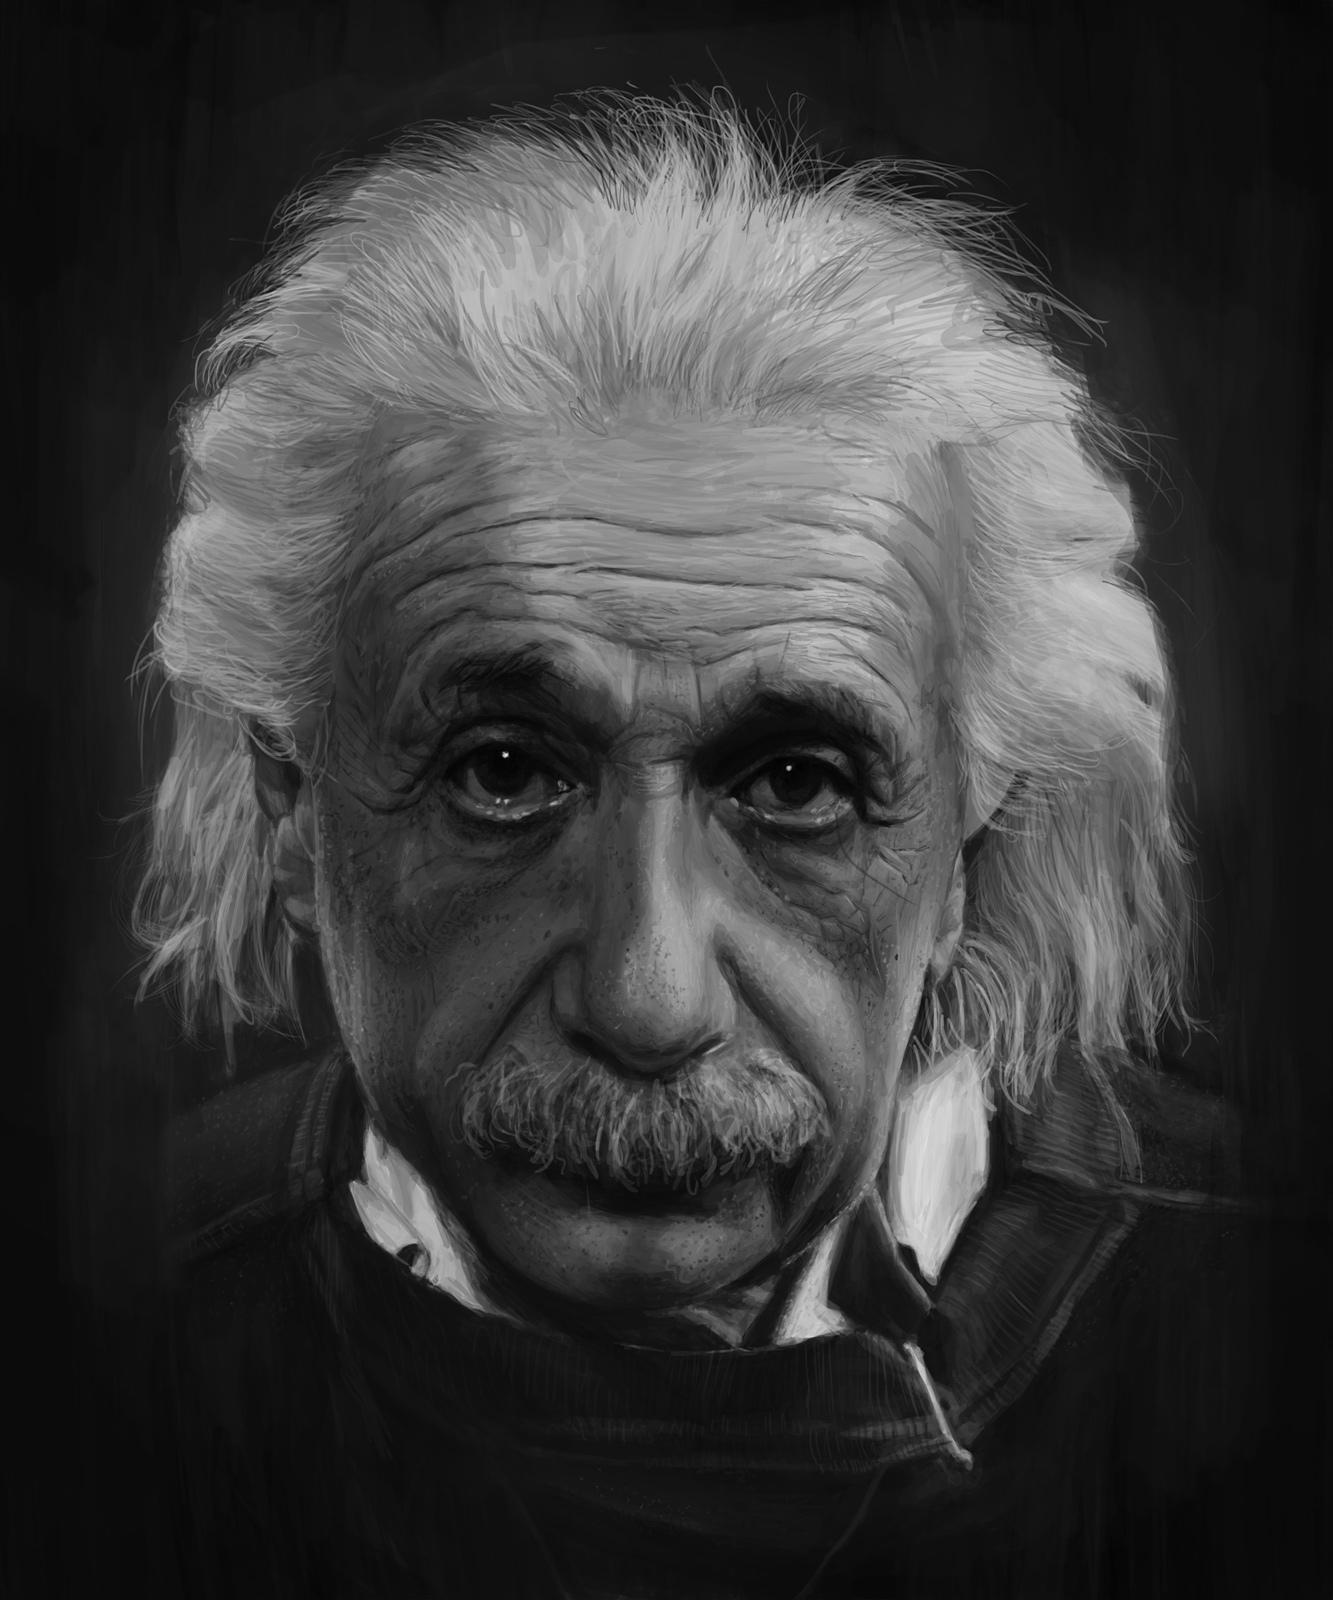 Albert Einstein Ulm 14 maart 1879 Princeton 18 april 1955 was een DuitsZwitsersAmerikaanse theoretisch natuurkundige van Joodse afkomst